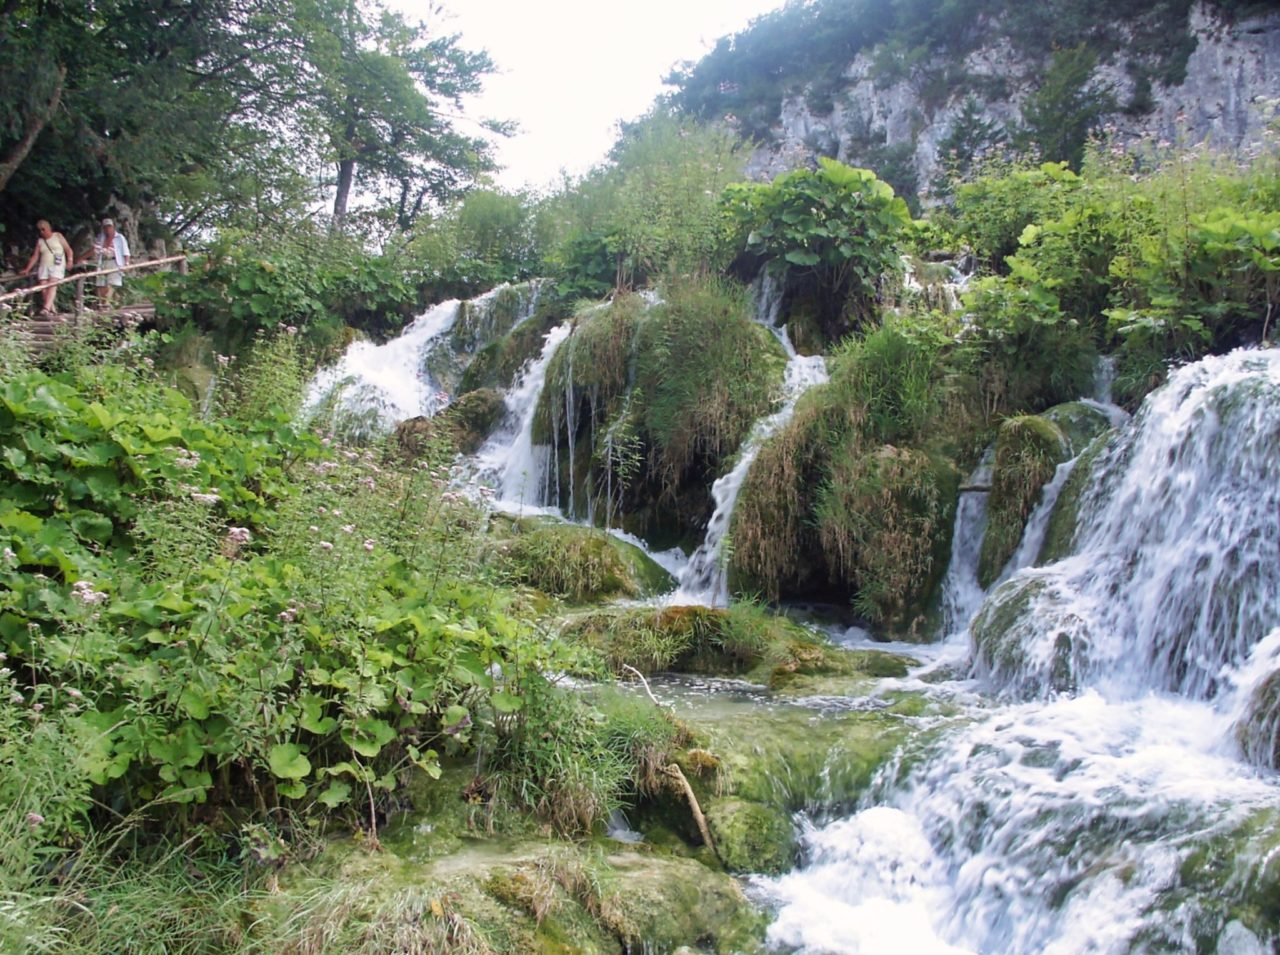 Prachtige watervallen